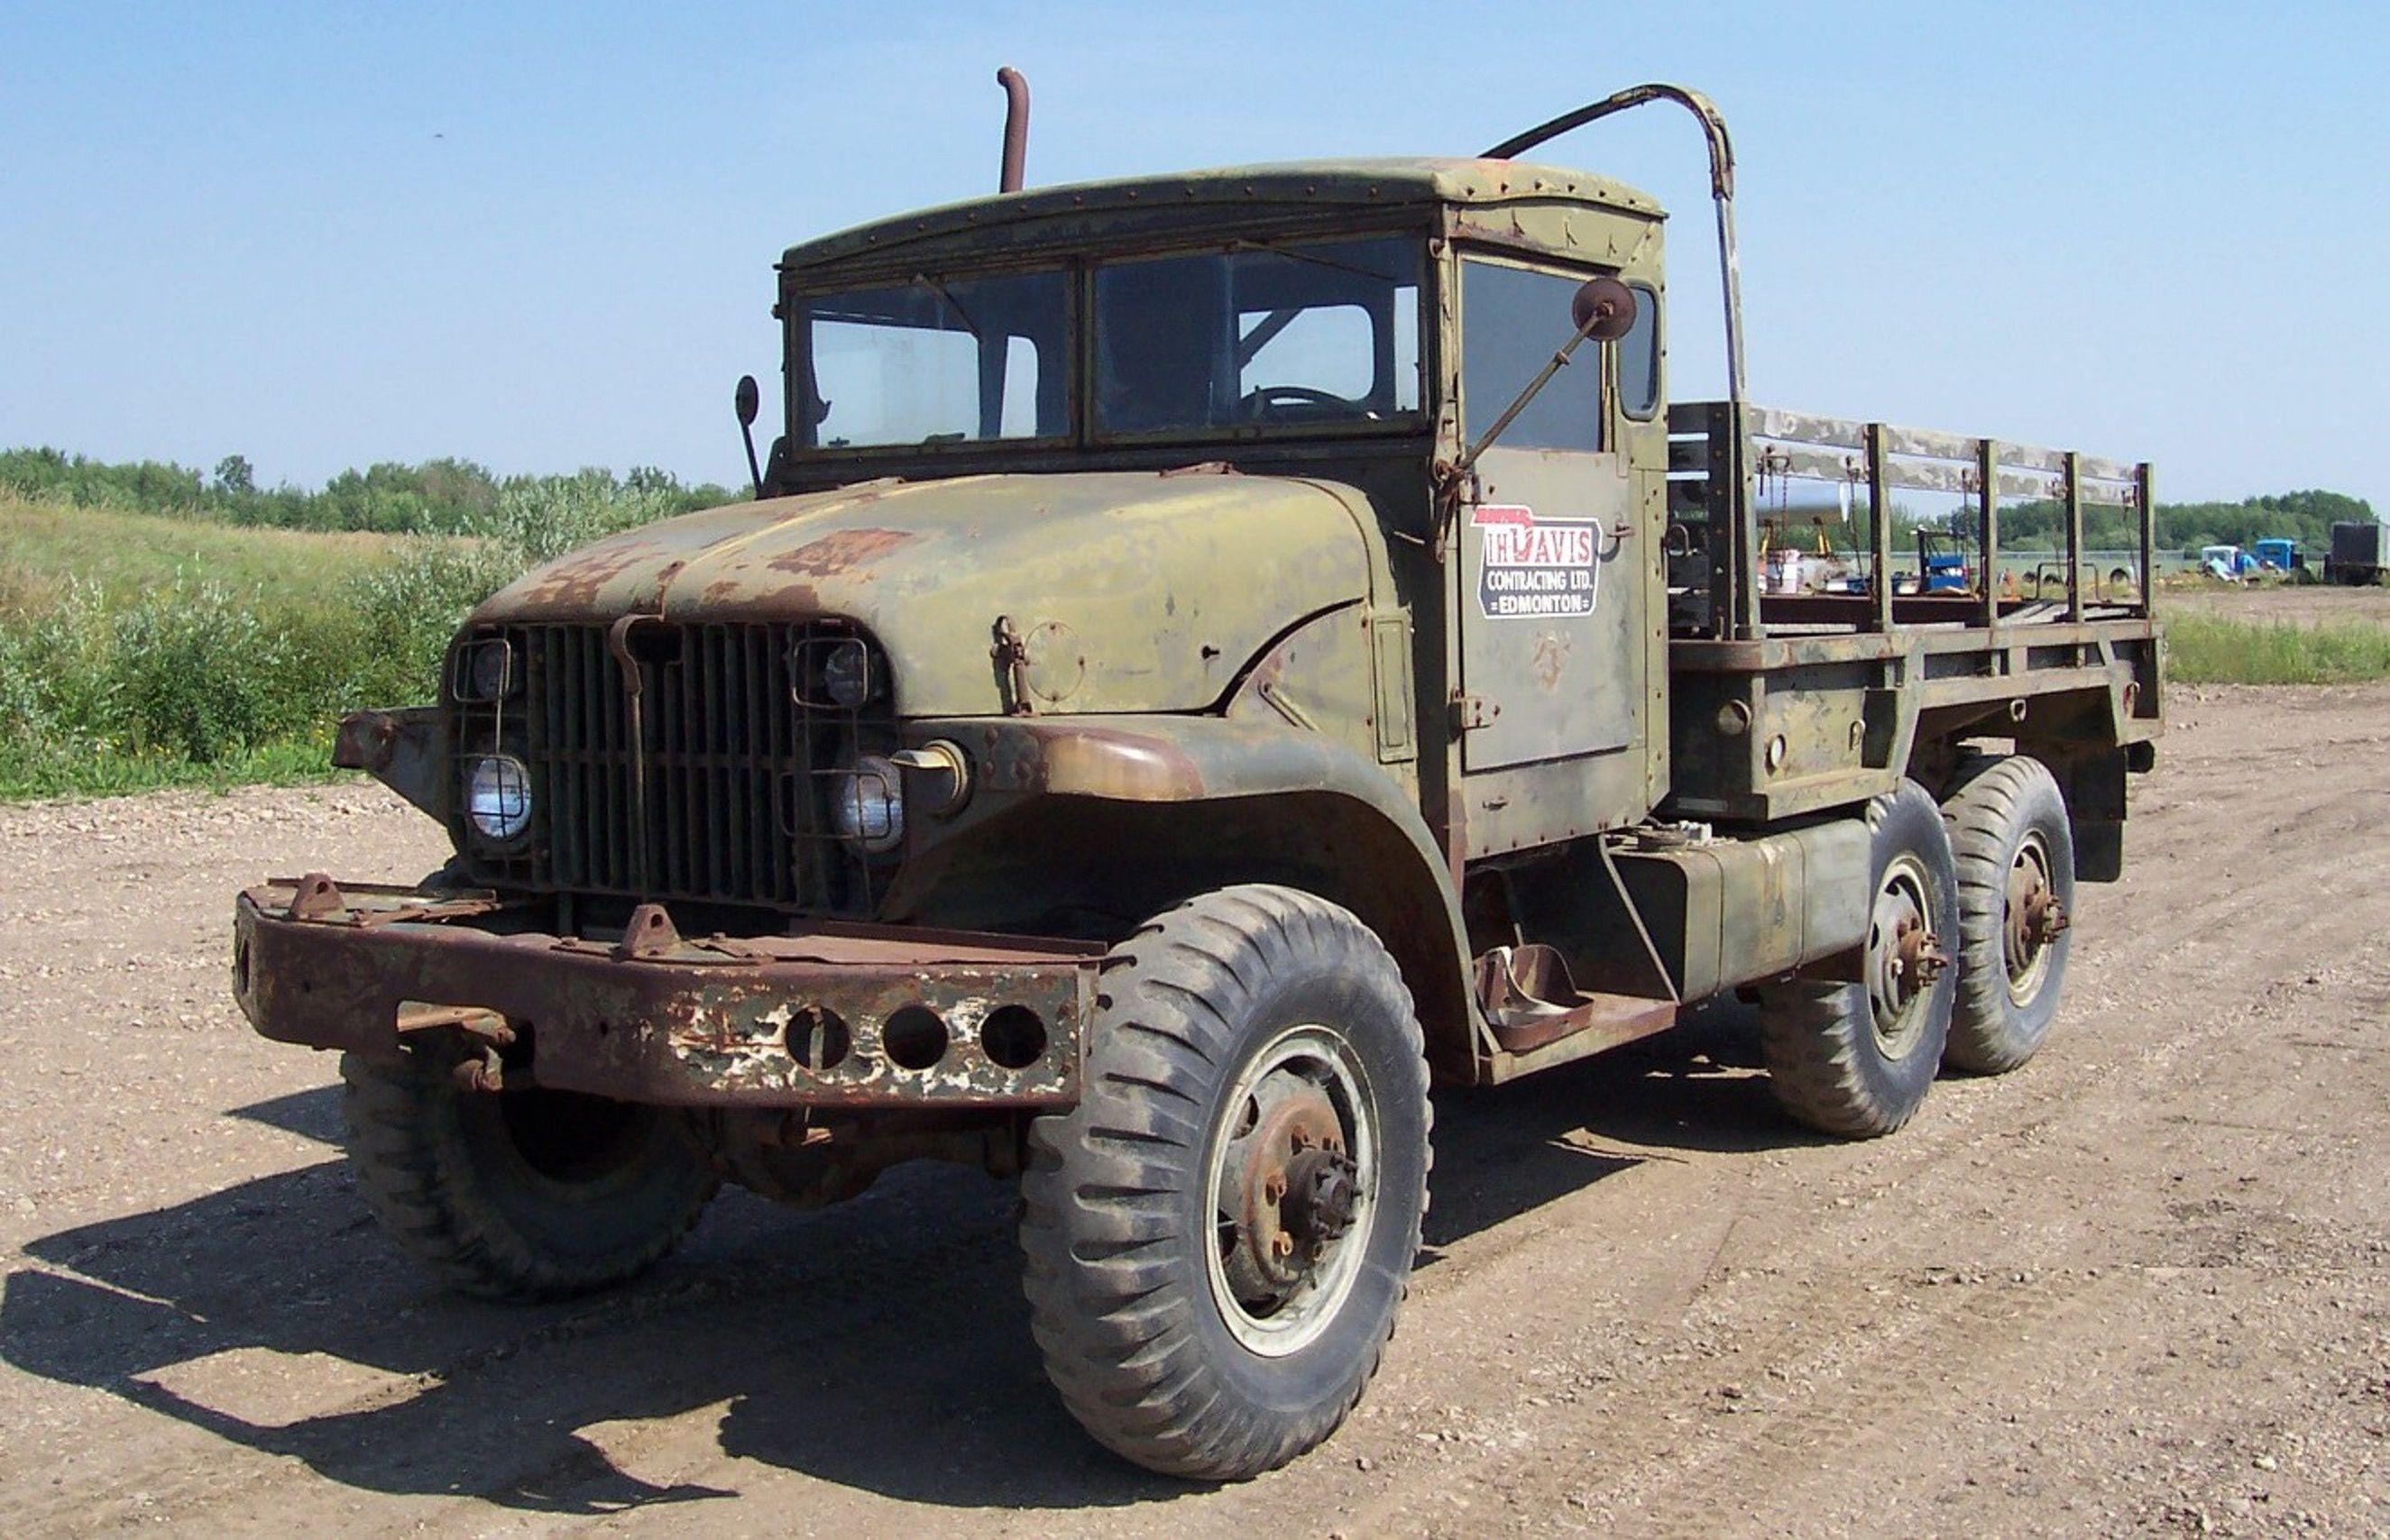 GMC M-211 6x6 Cargo | GMC | Pinterest | Vehicle, Cars and Gmc vehicles